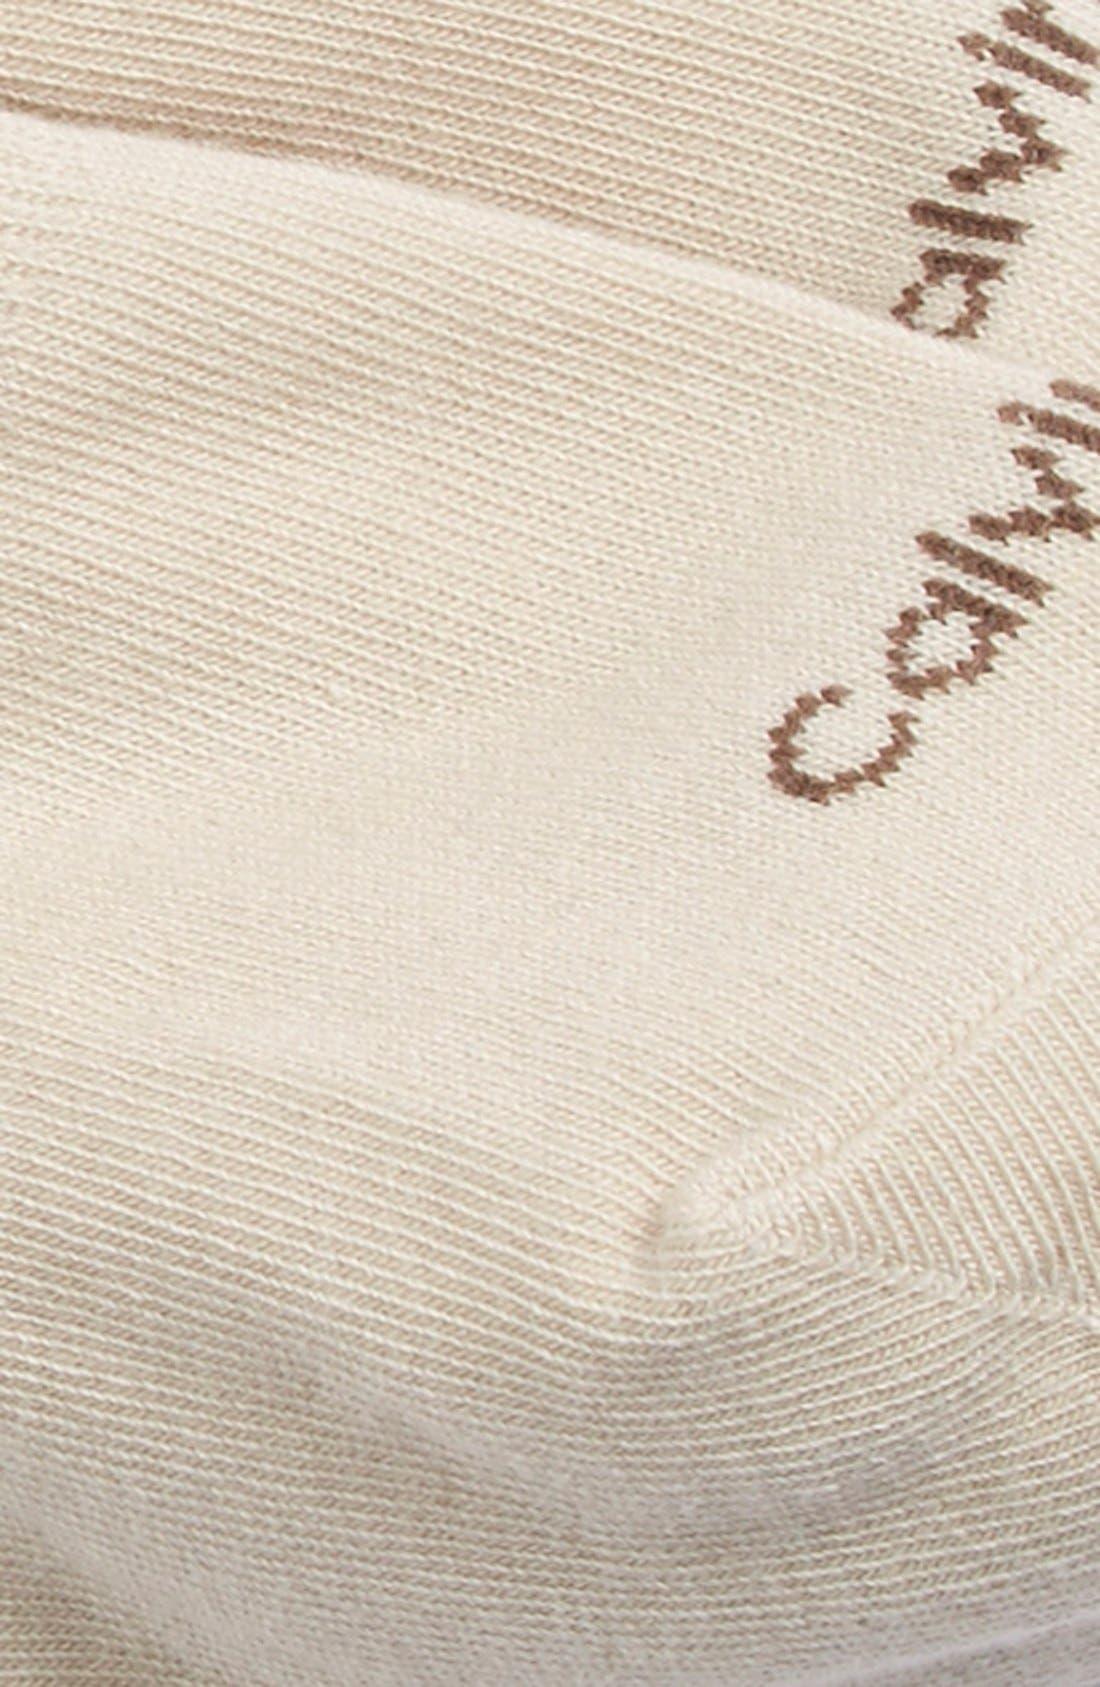 CALVIN KLEIN, No-Show Socks, Alternate thumbnail 2, color, 252